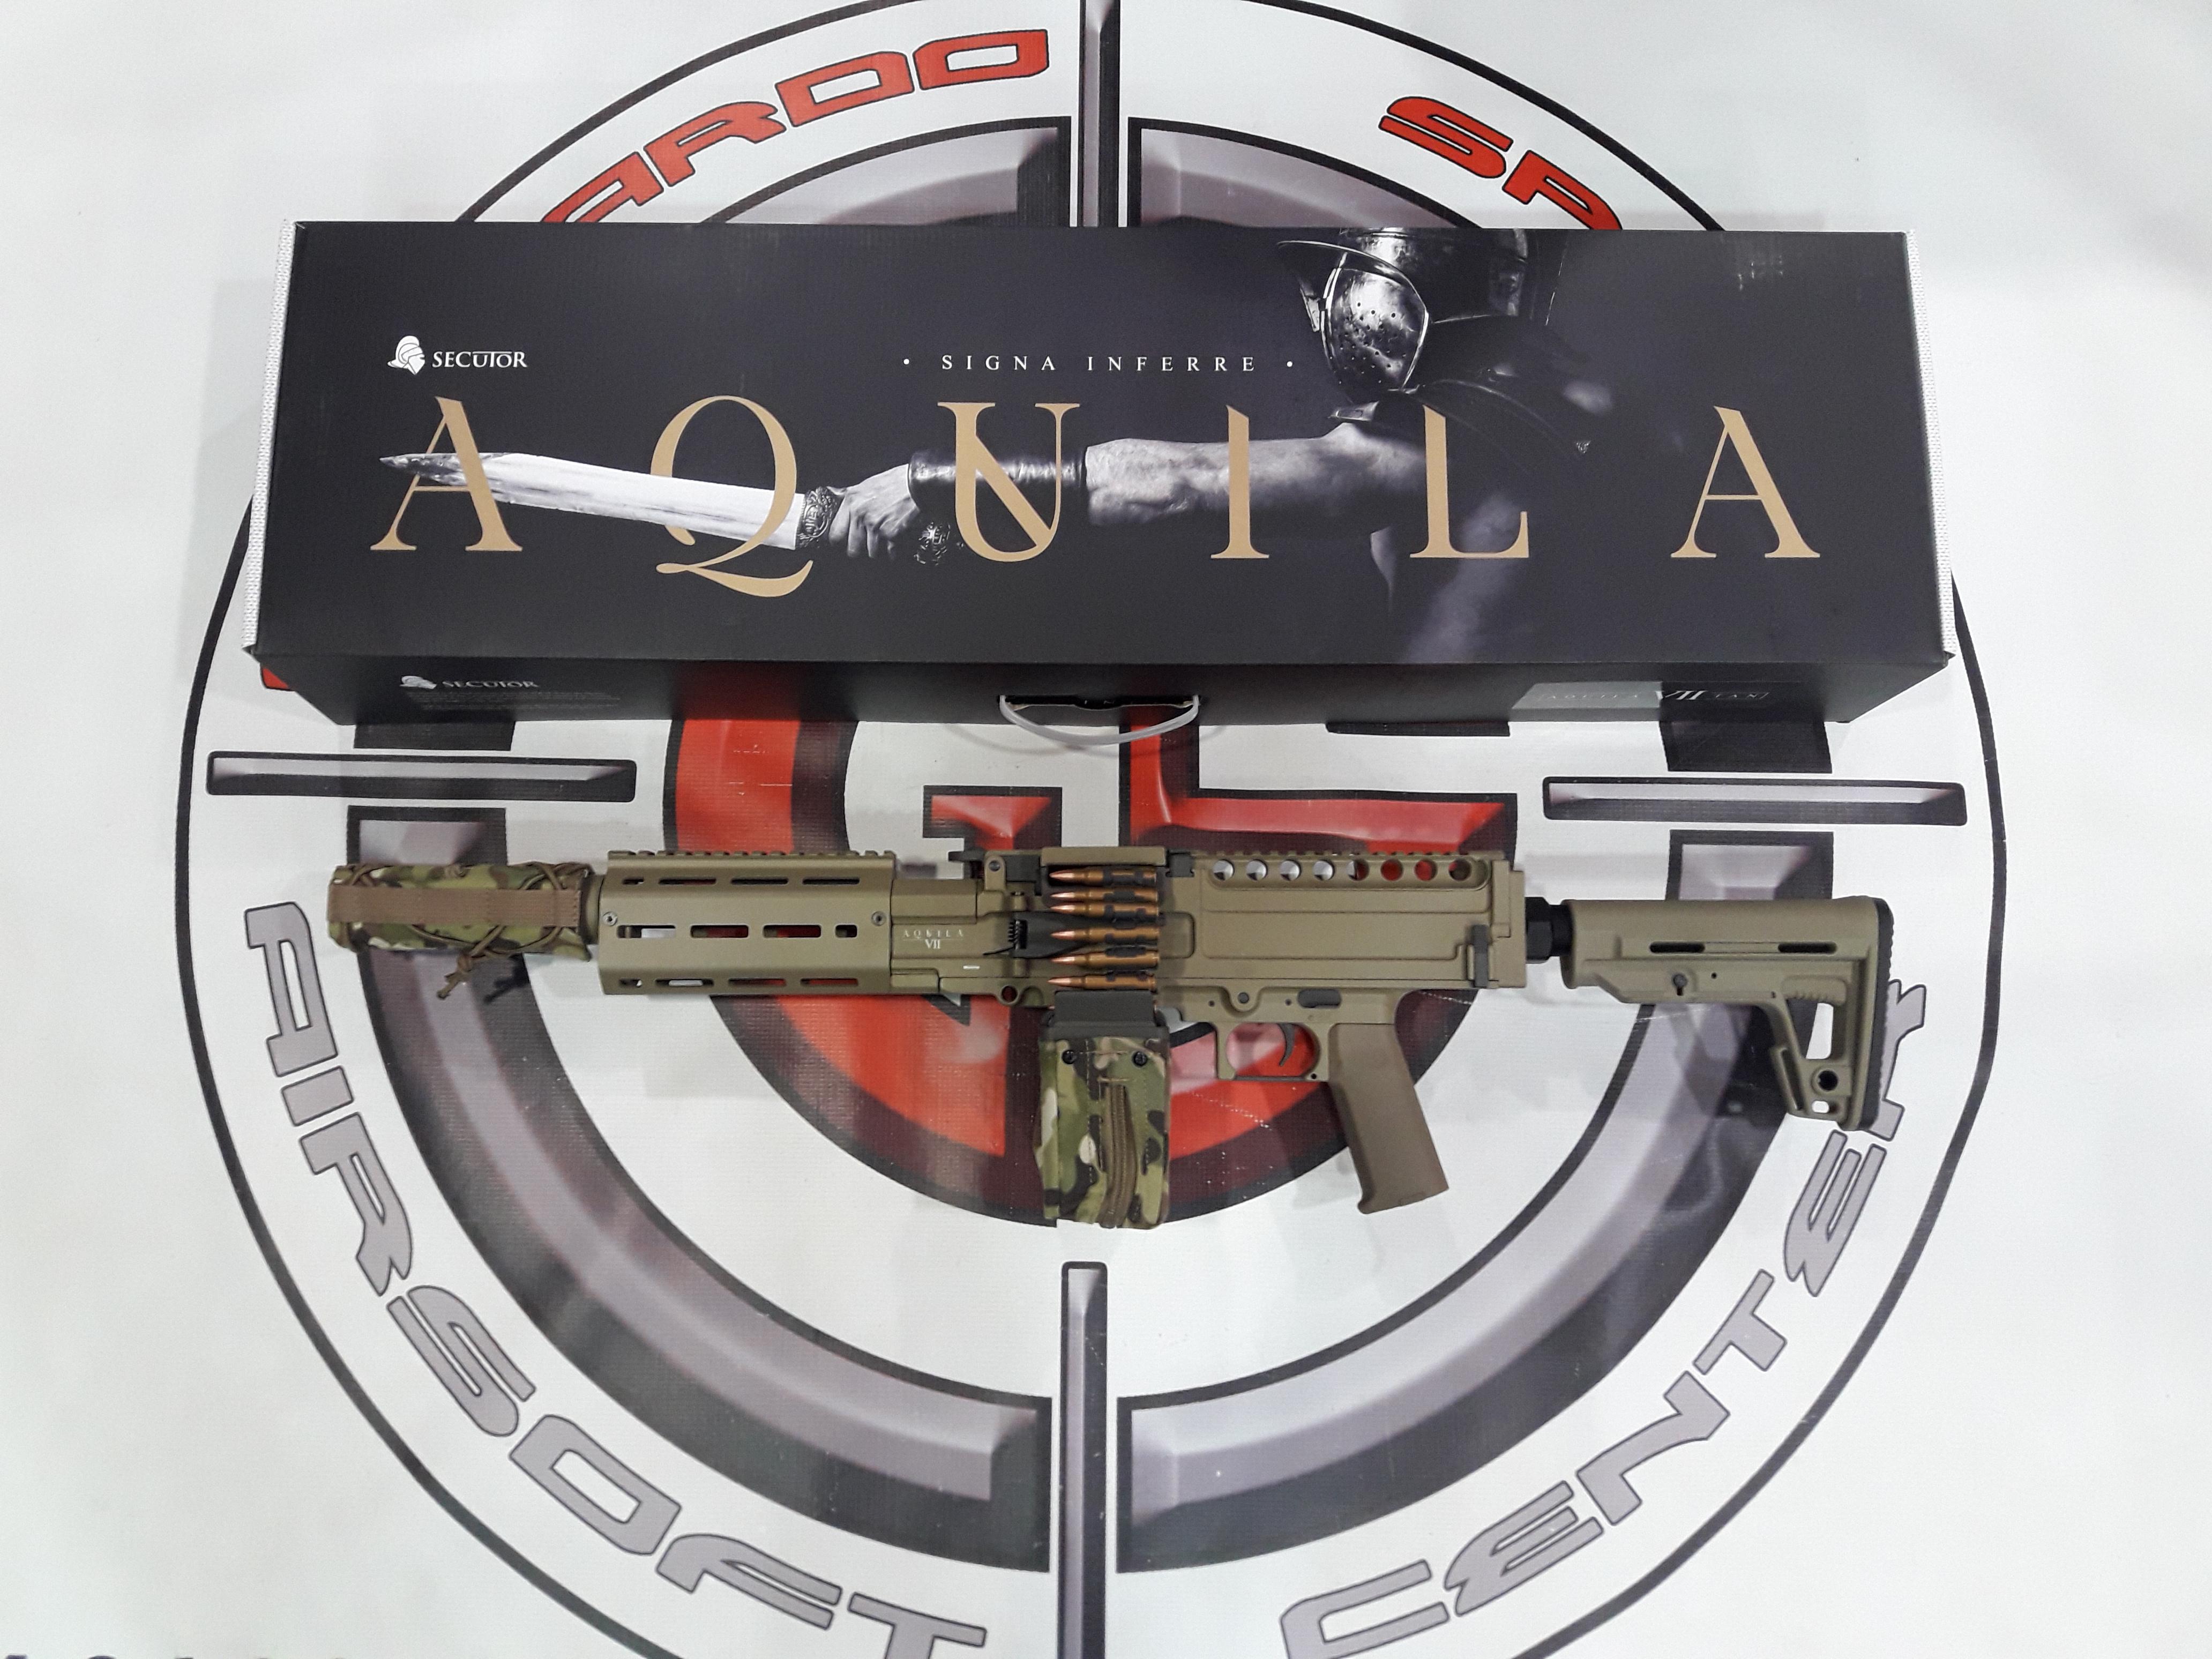 LMG AQUILA VII TAN SECUTOR ARMS